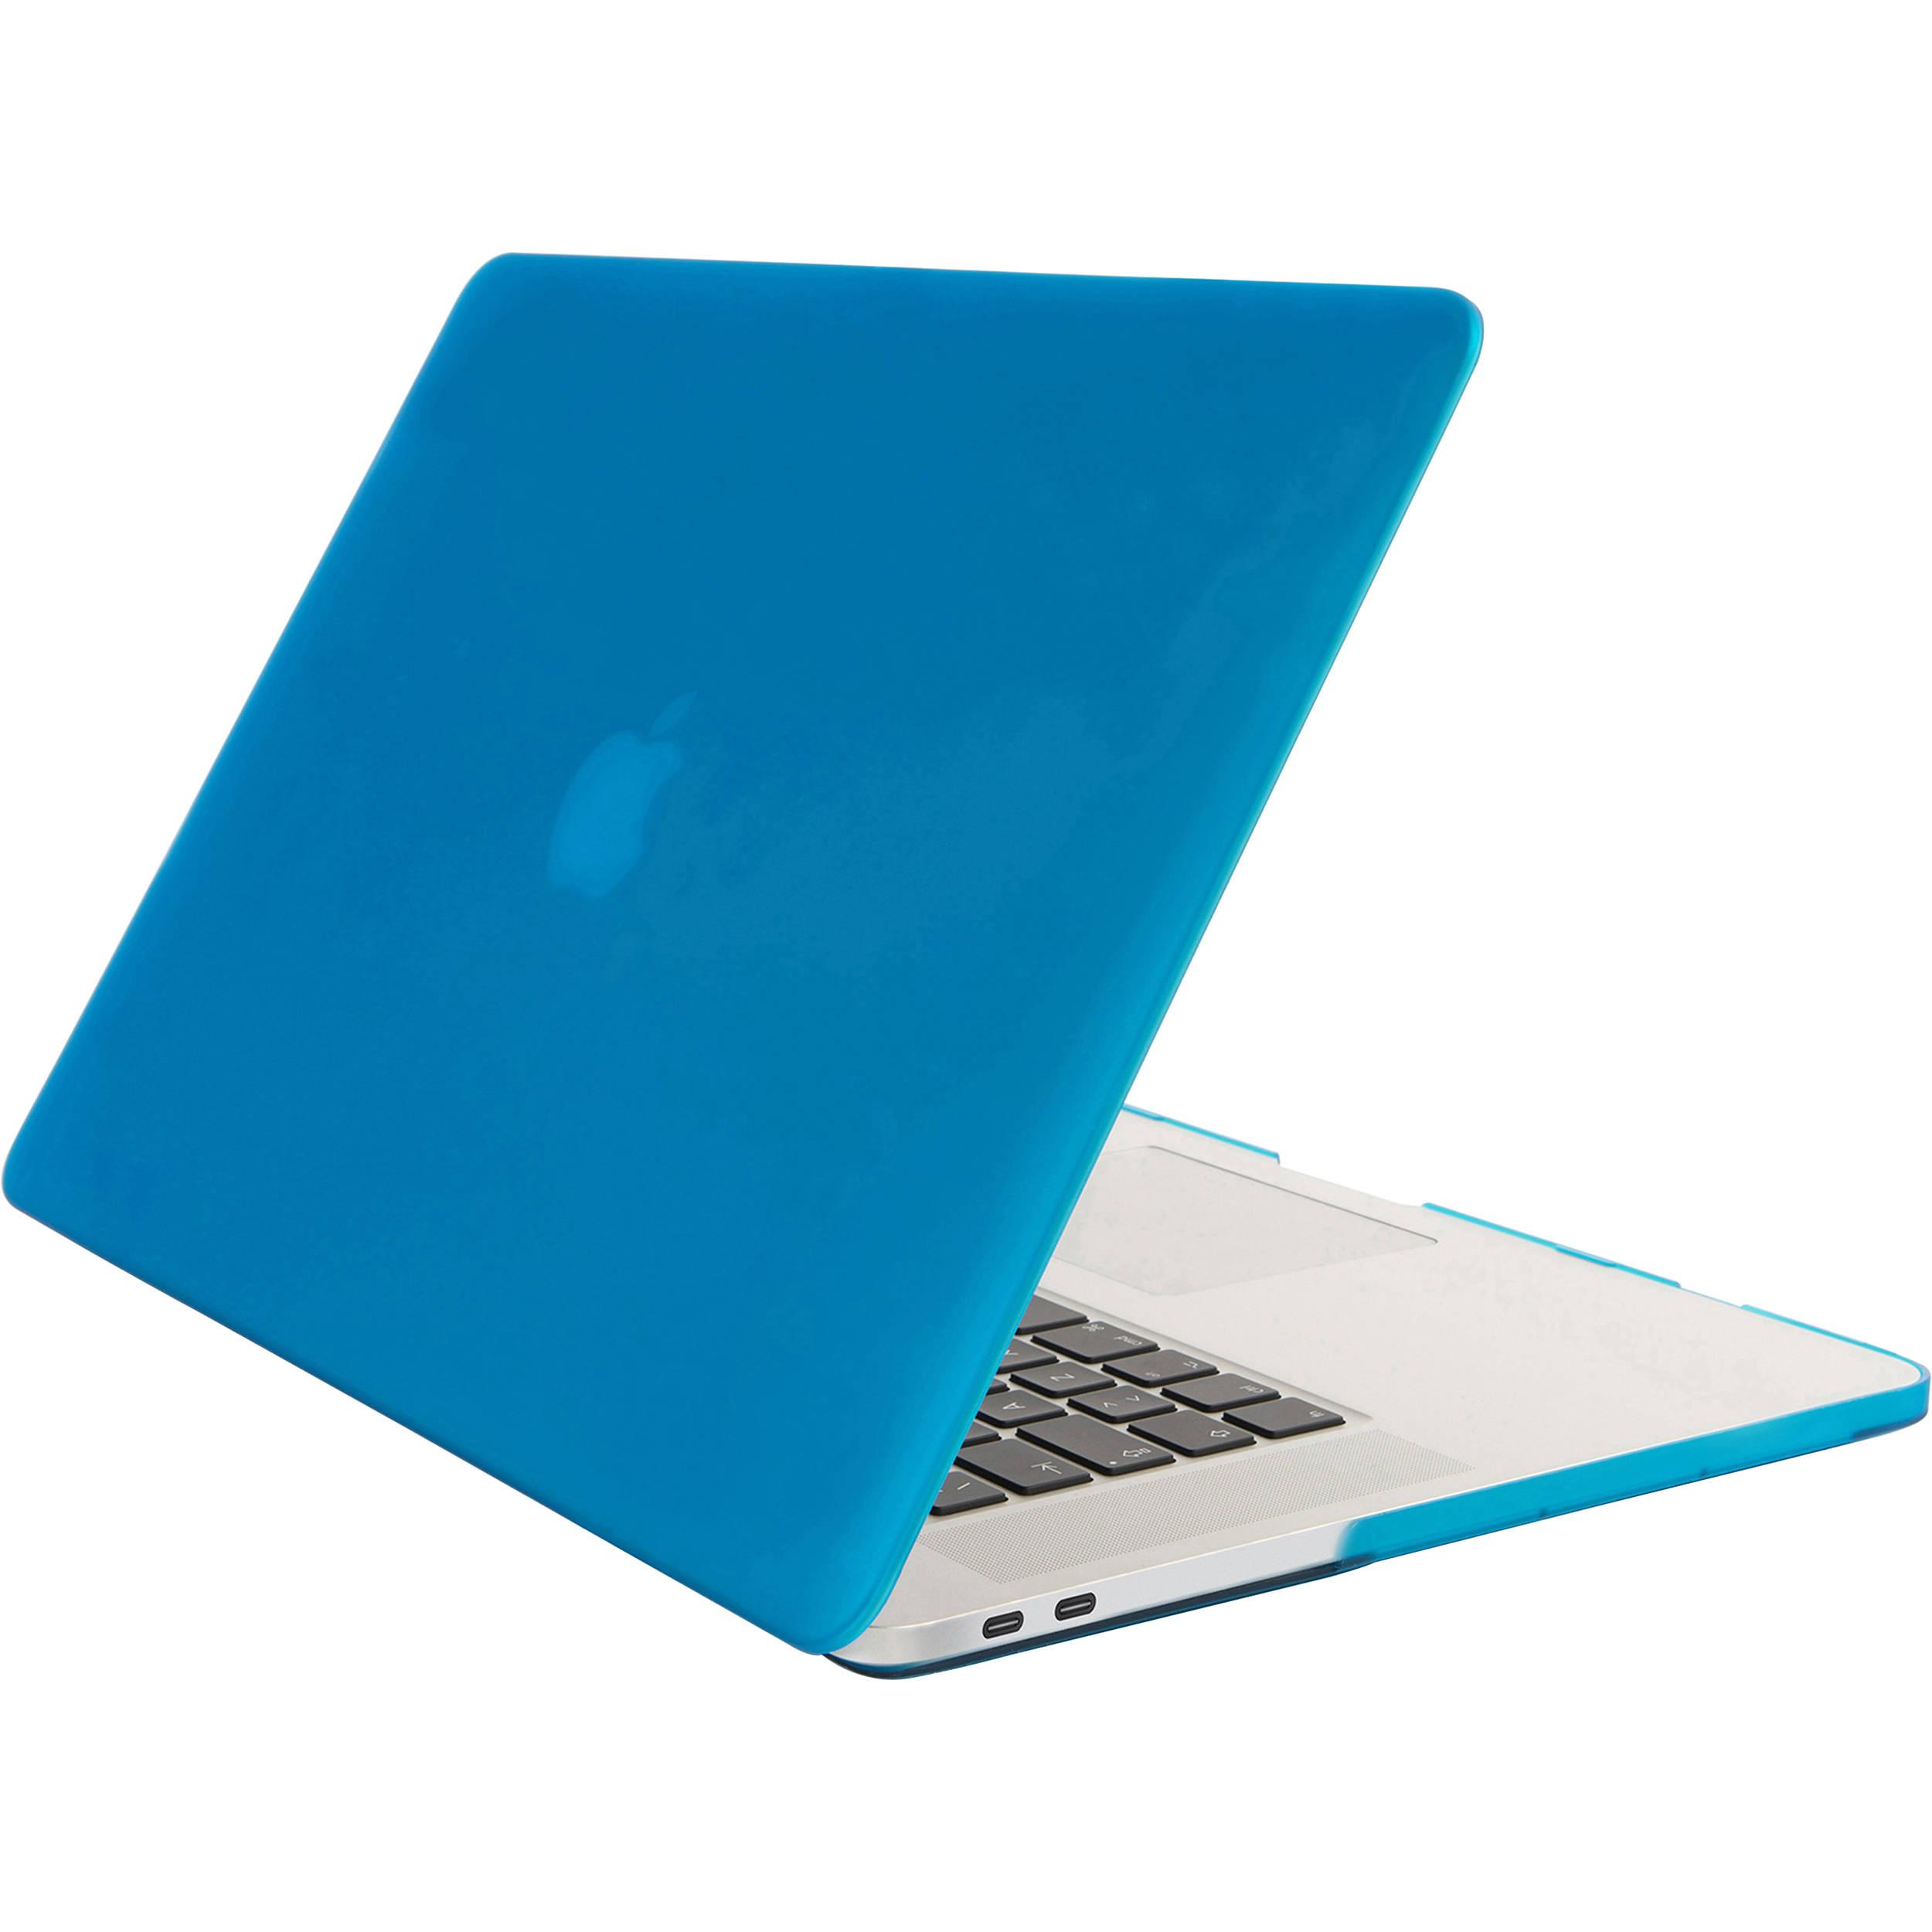 Tucano Nido Hard Shell Case For Macbook Pro Hsni Mbp15 Z B Amp H